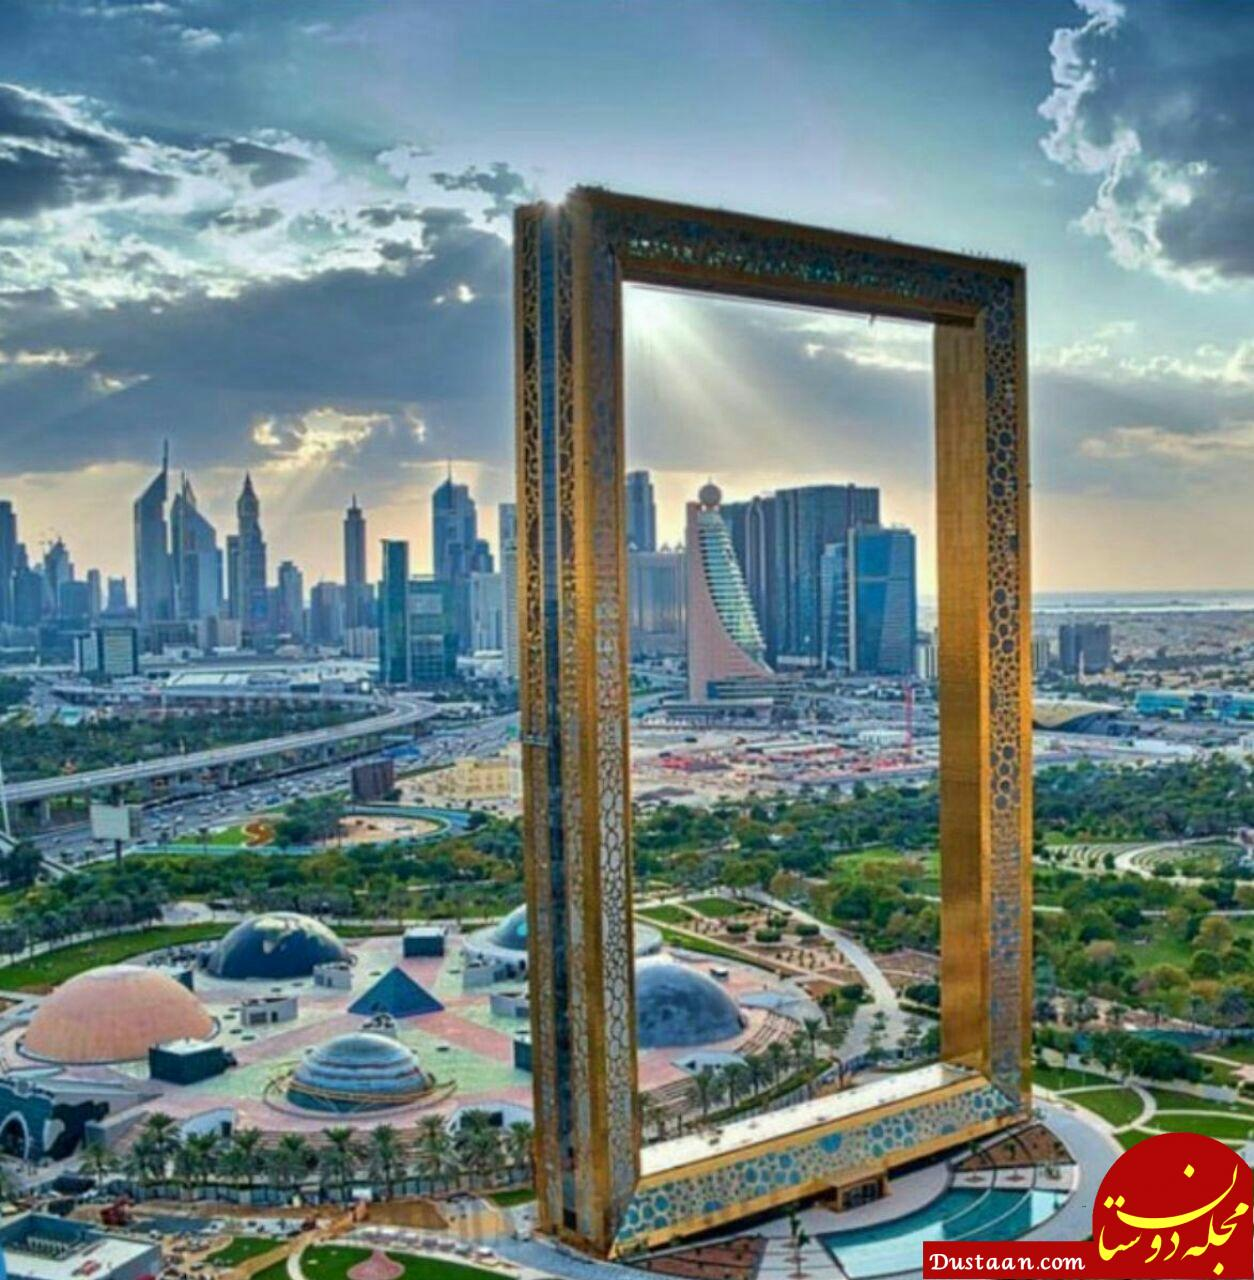 www.dustaan.com بزرگترین قاب عکس دنیا در دبی +عکس